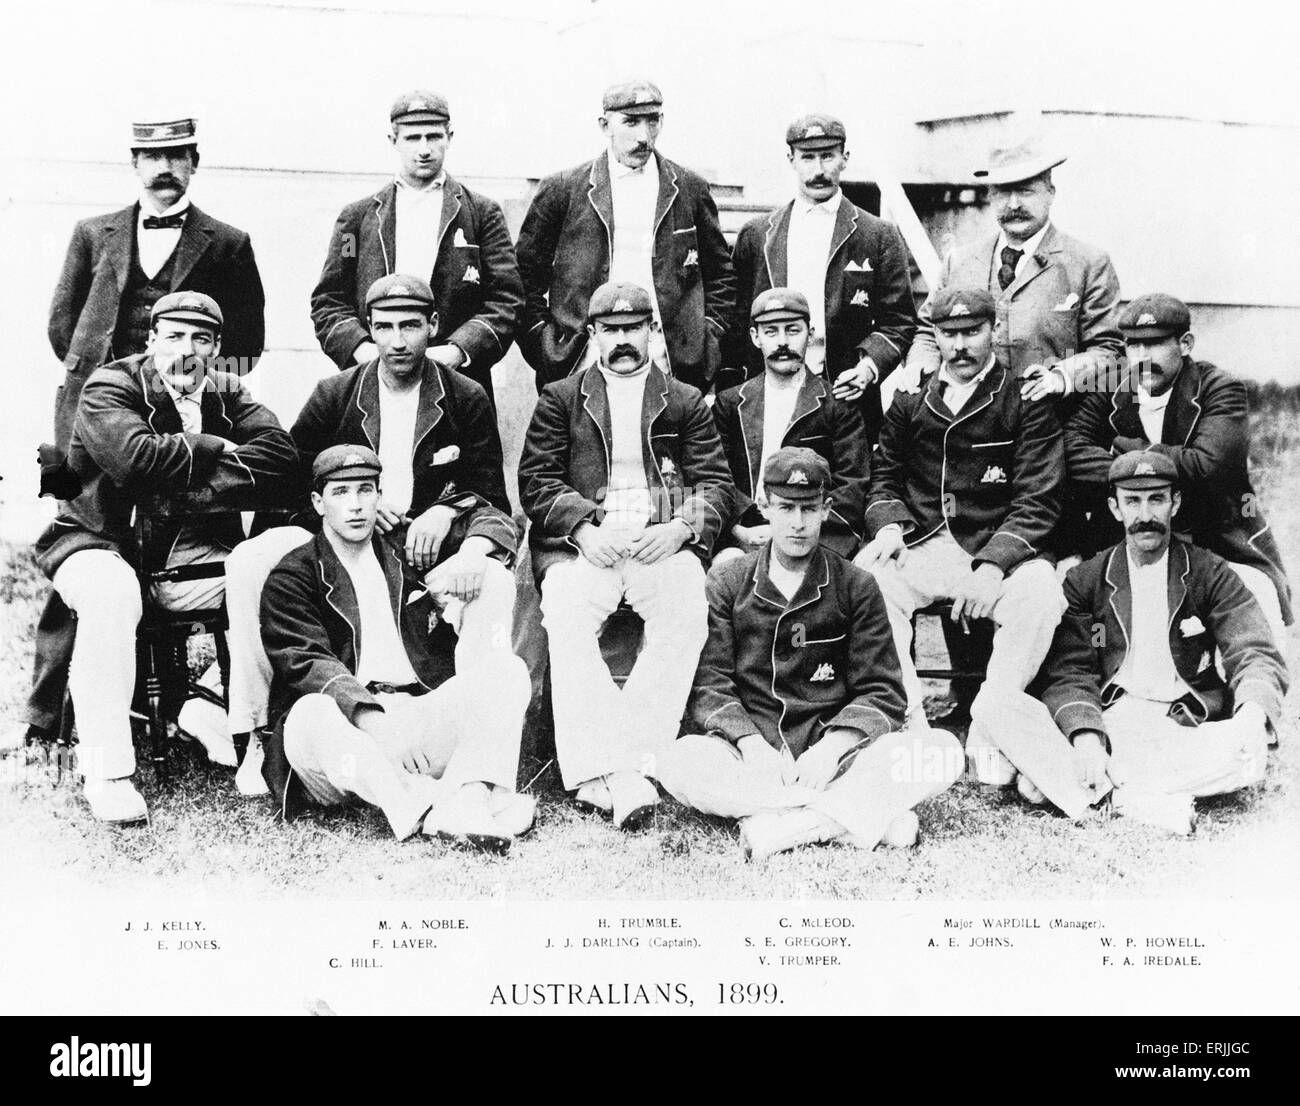 The Australia cricket team of 1899. - Stock Image